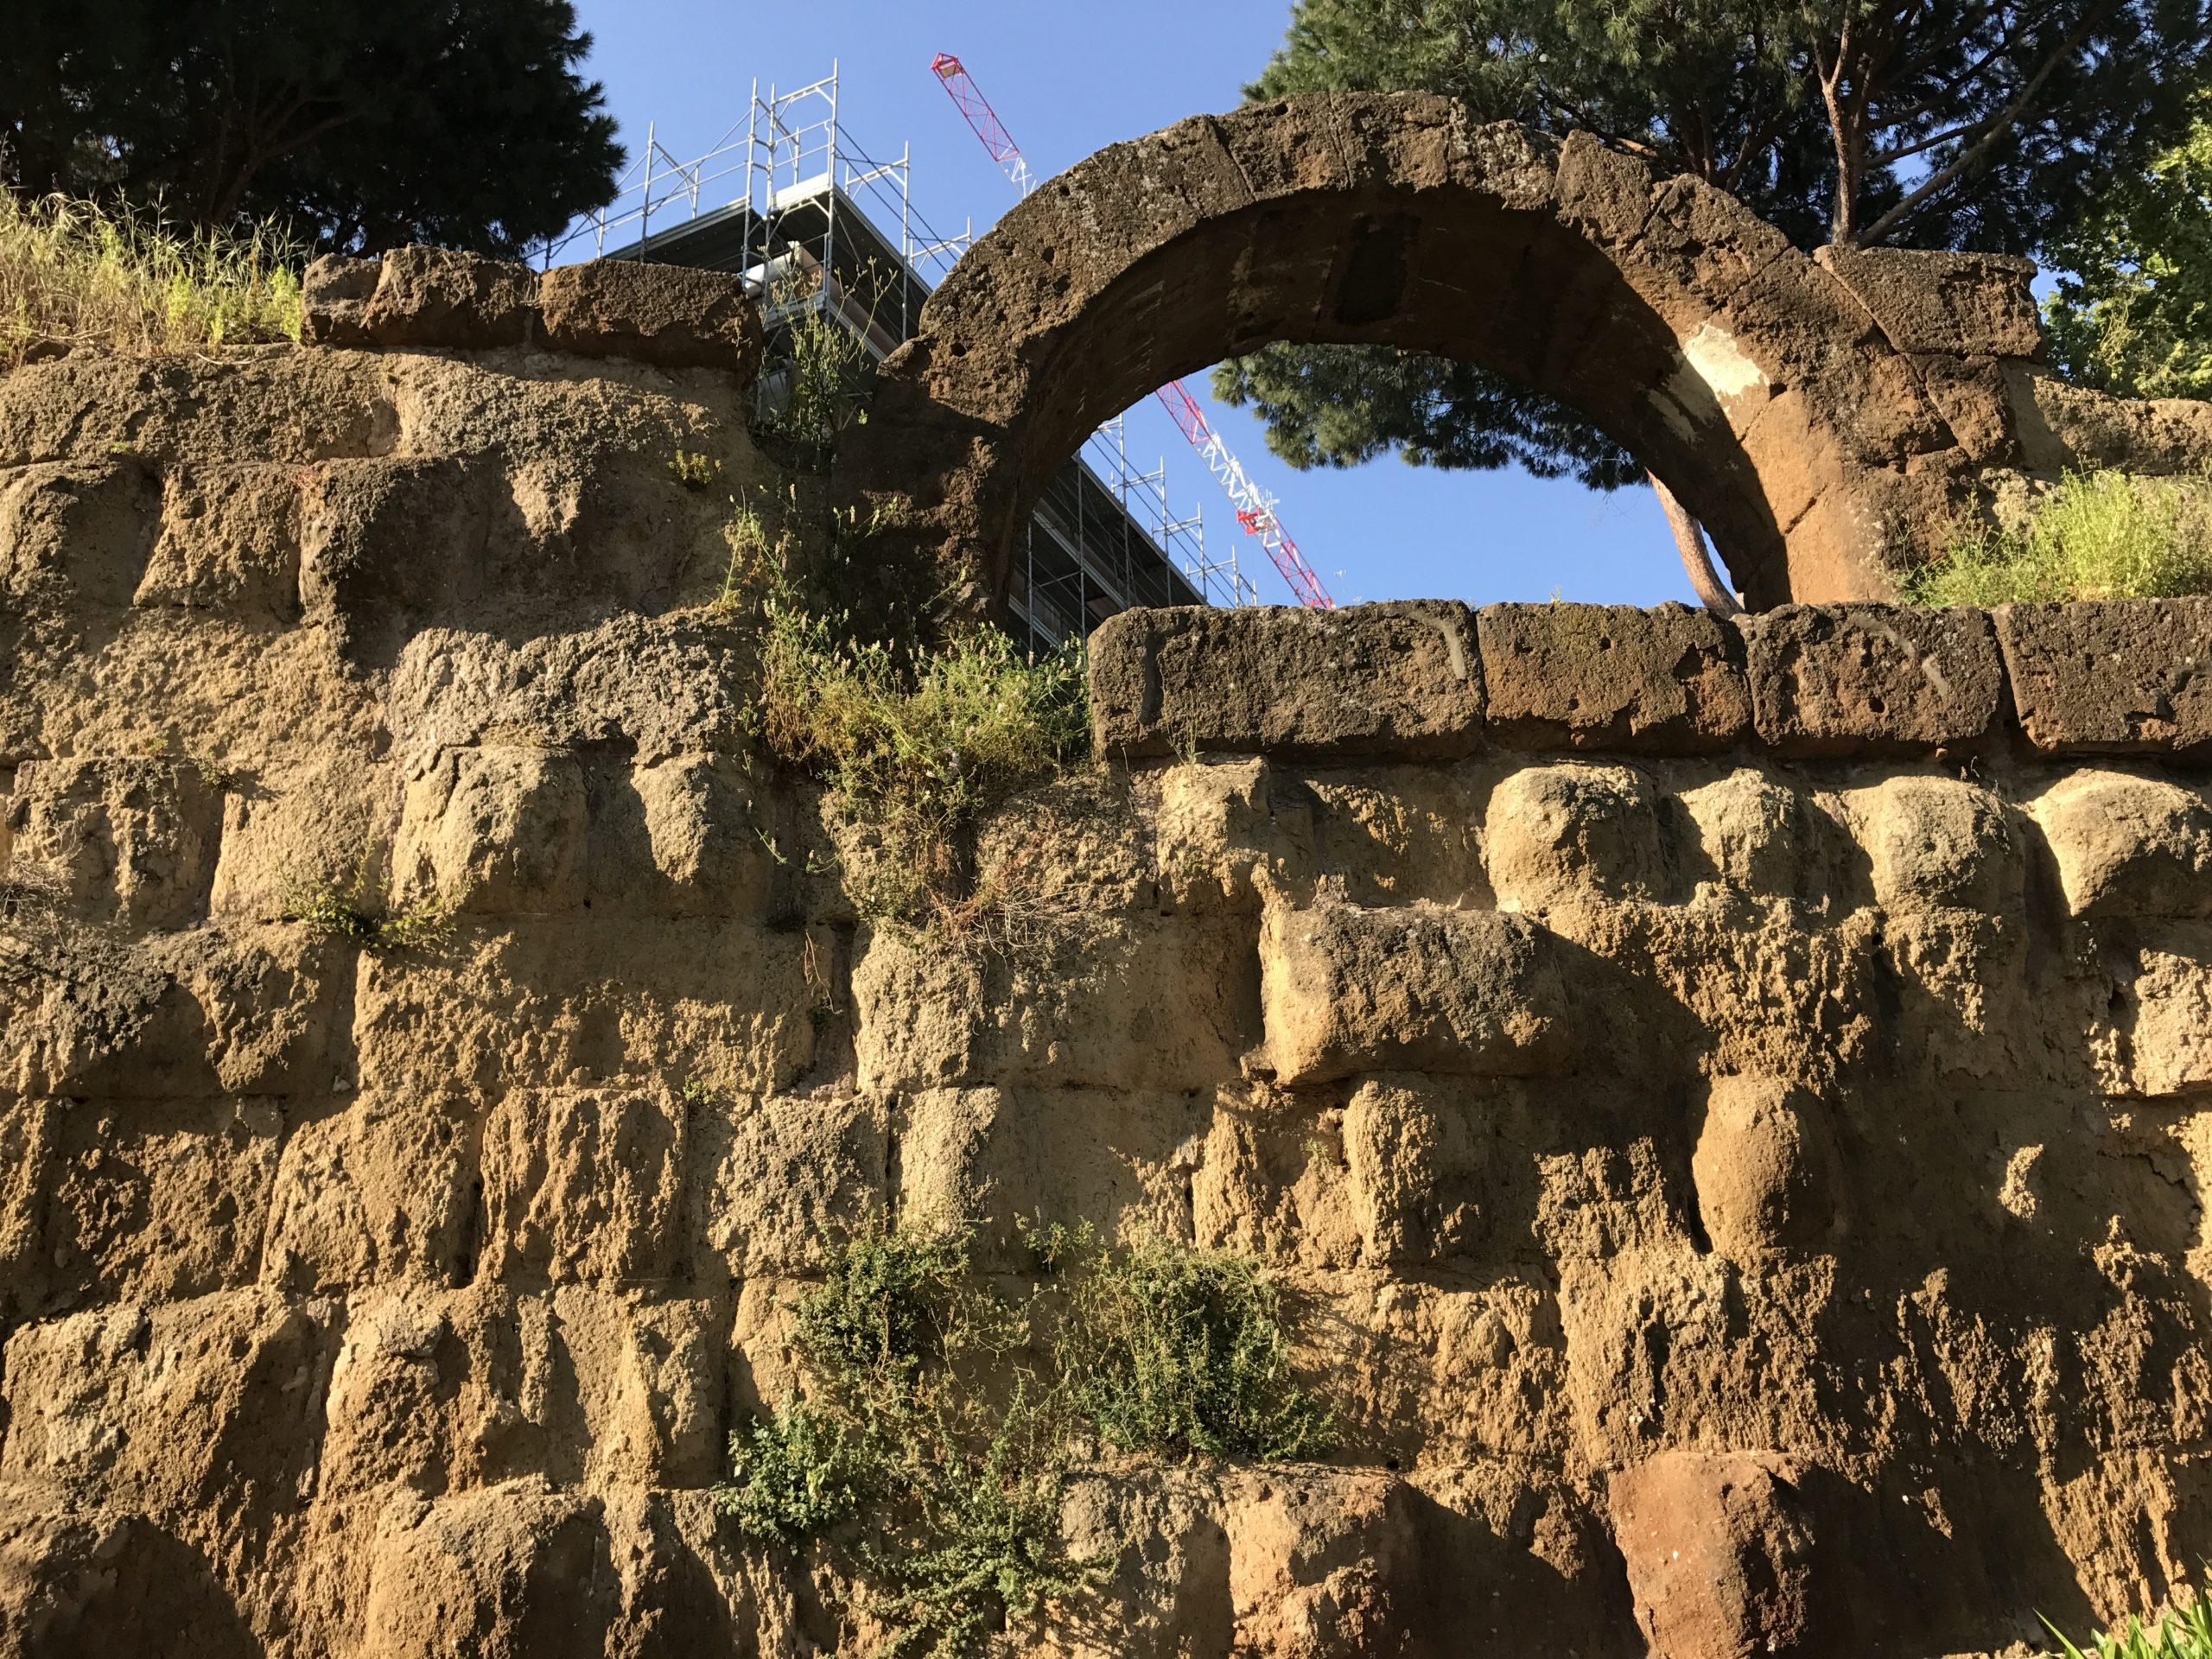 Murus Servii Tullii (Servian Walls)